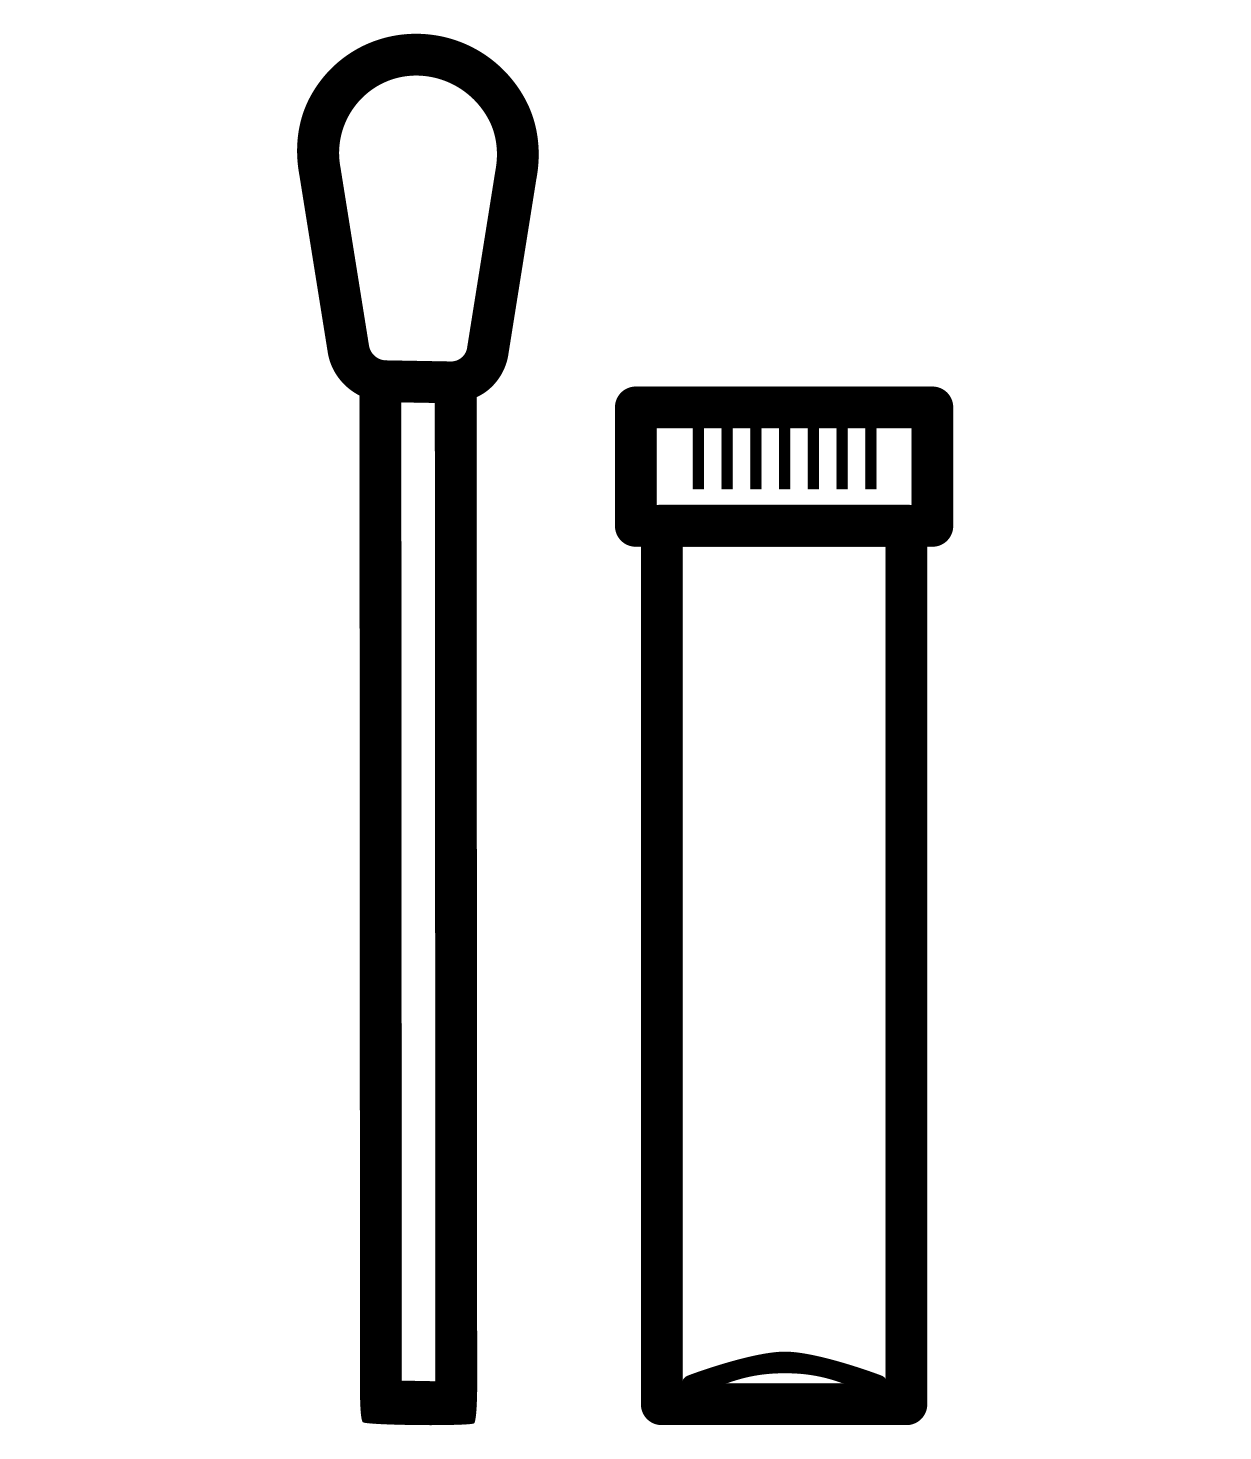 Amient Temperature Icon for Swabs